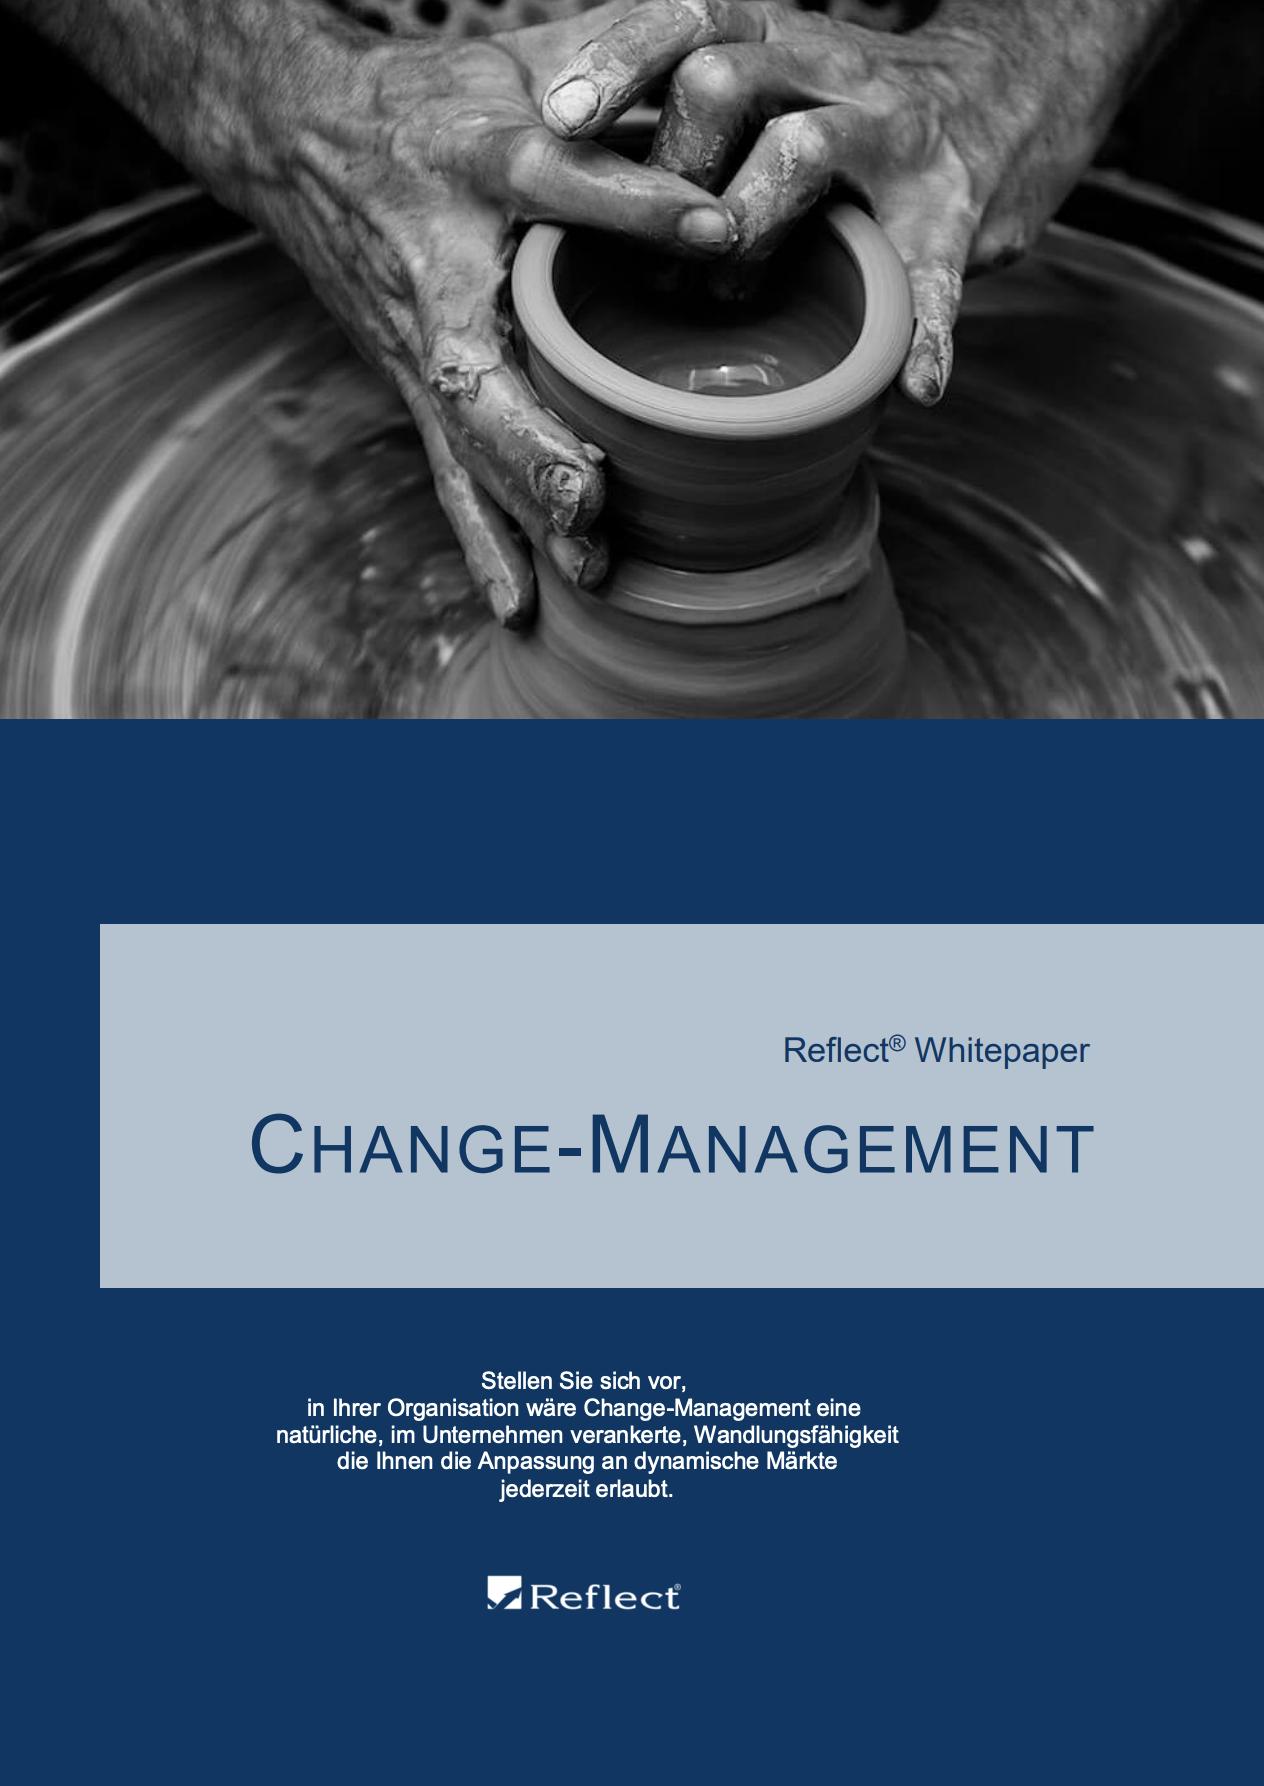 Reflect Whitepaper Change Management